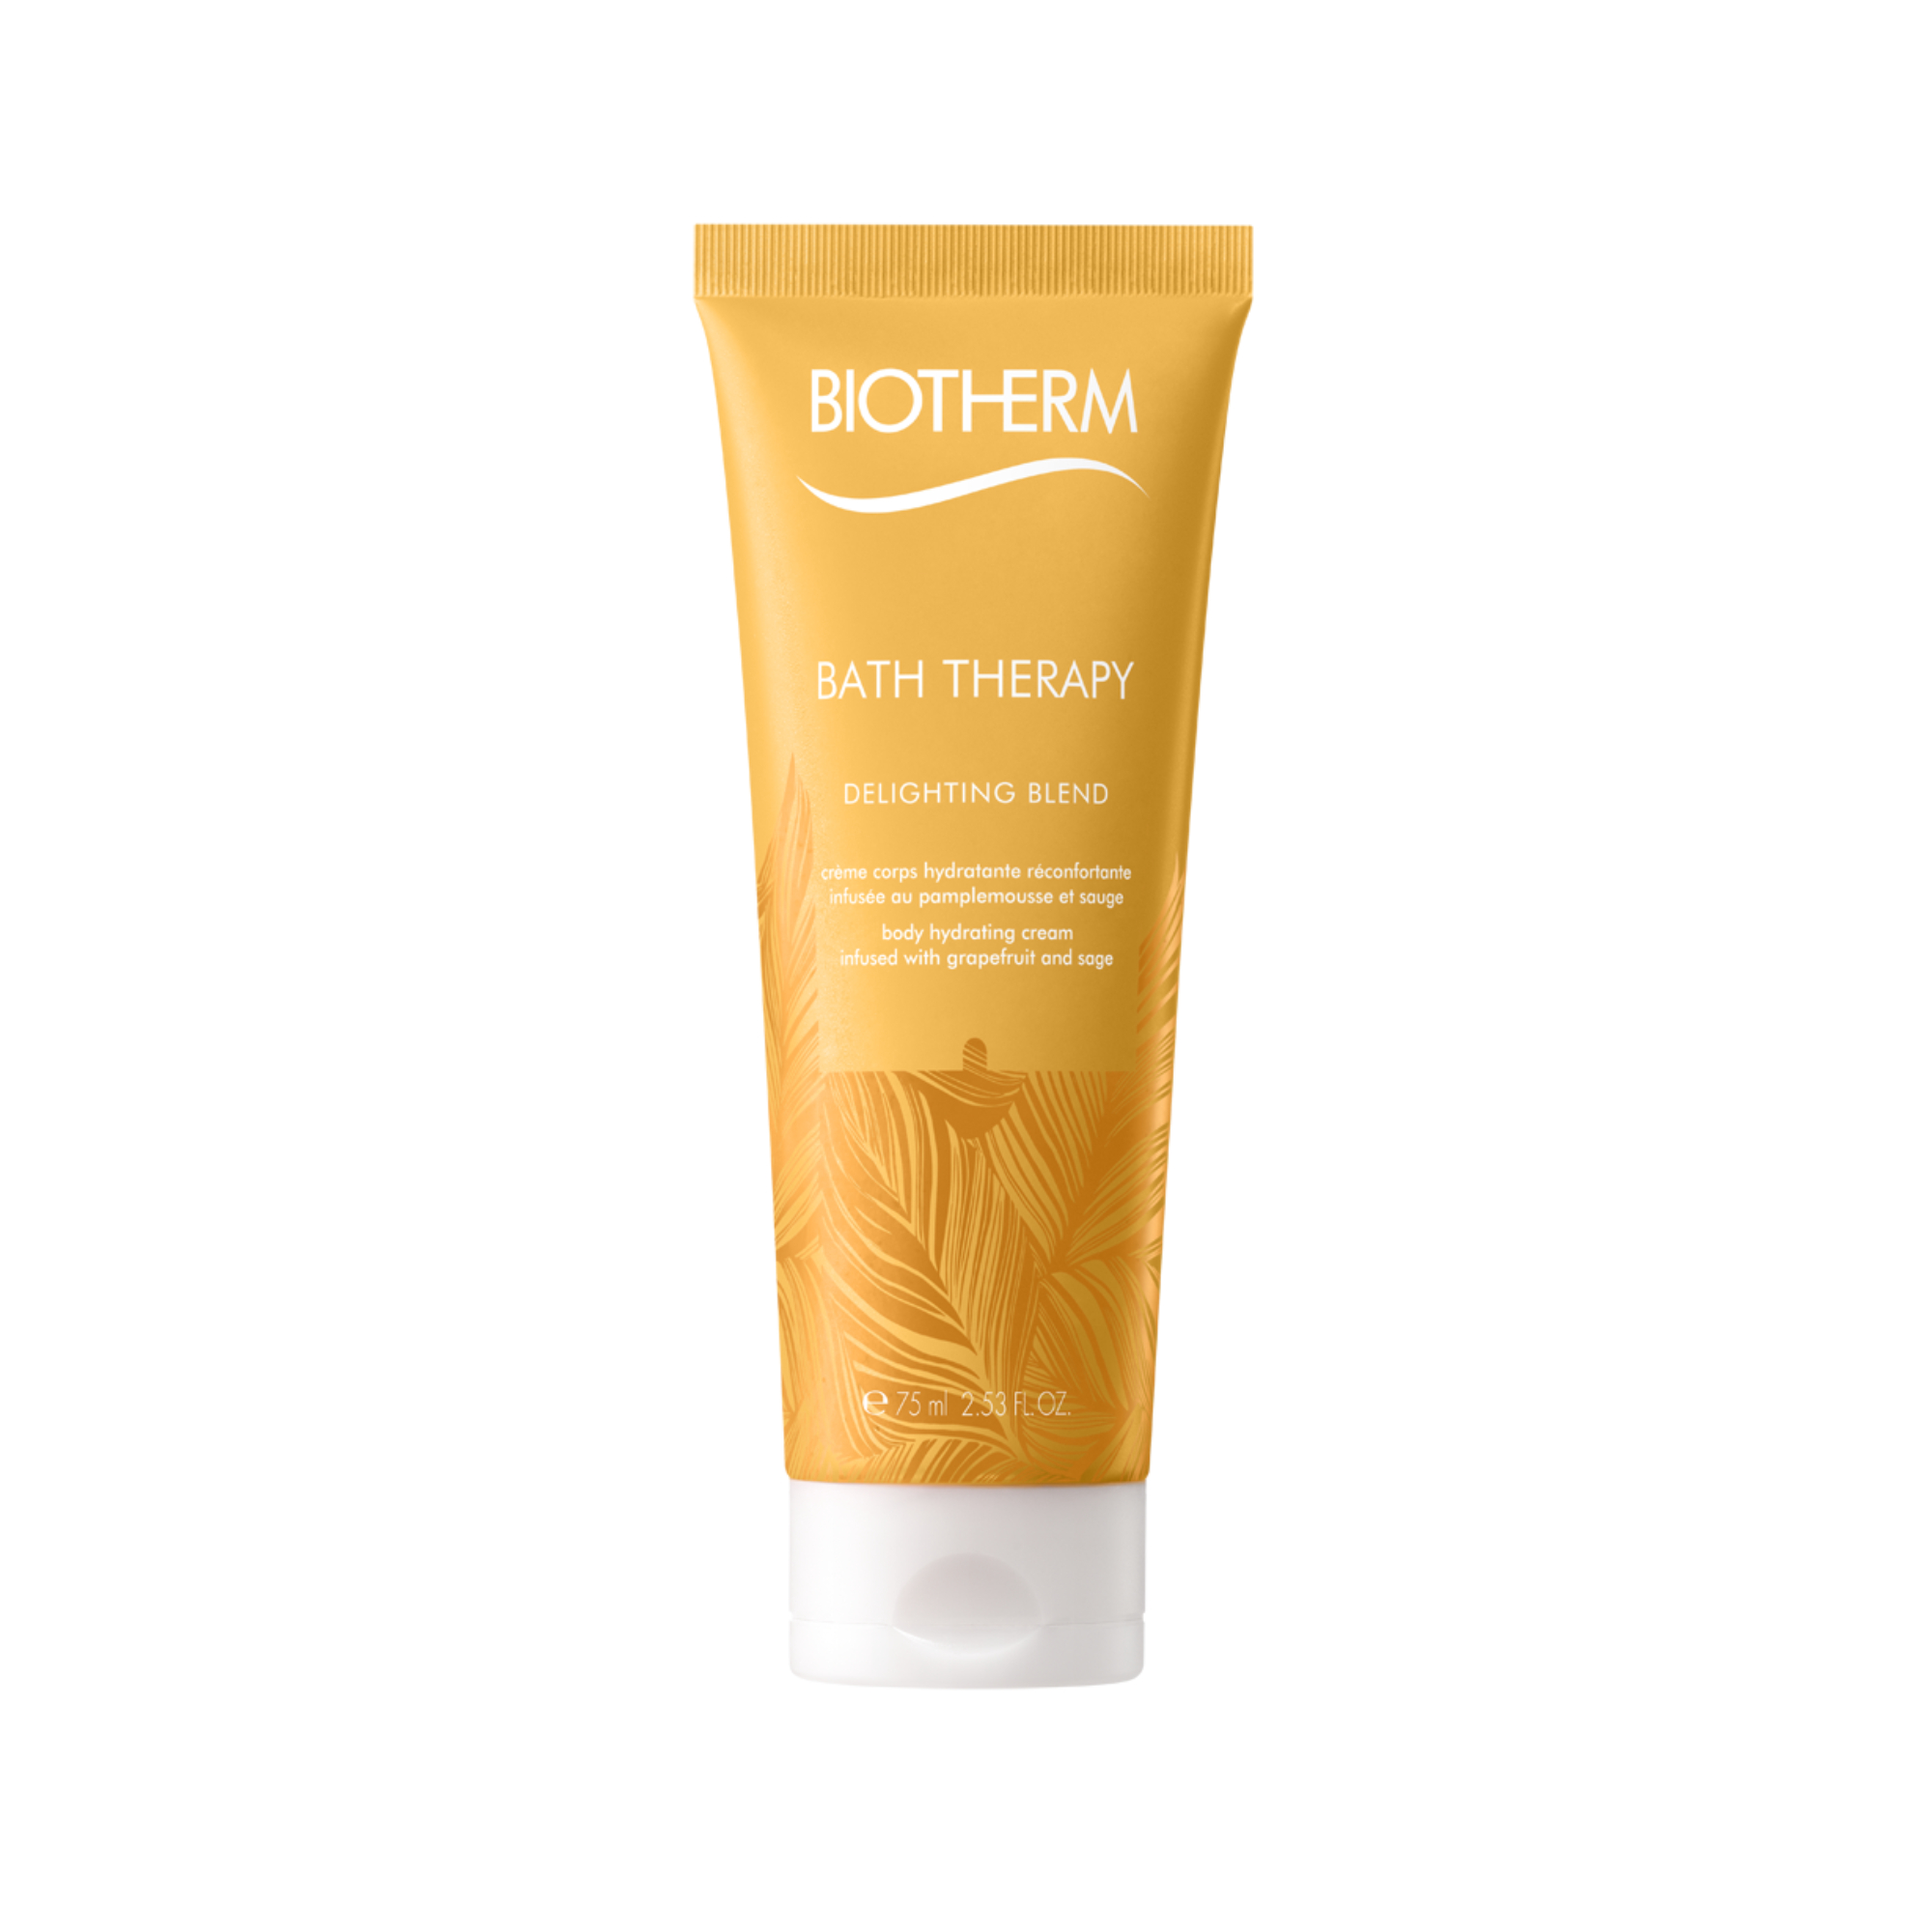 Bath Therapy Delighting Blend Body Cream Travel Size 75ml